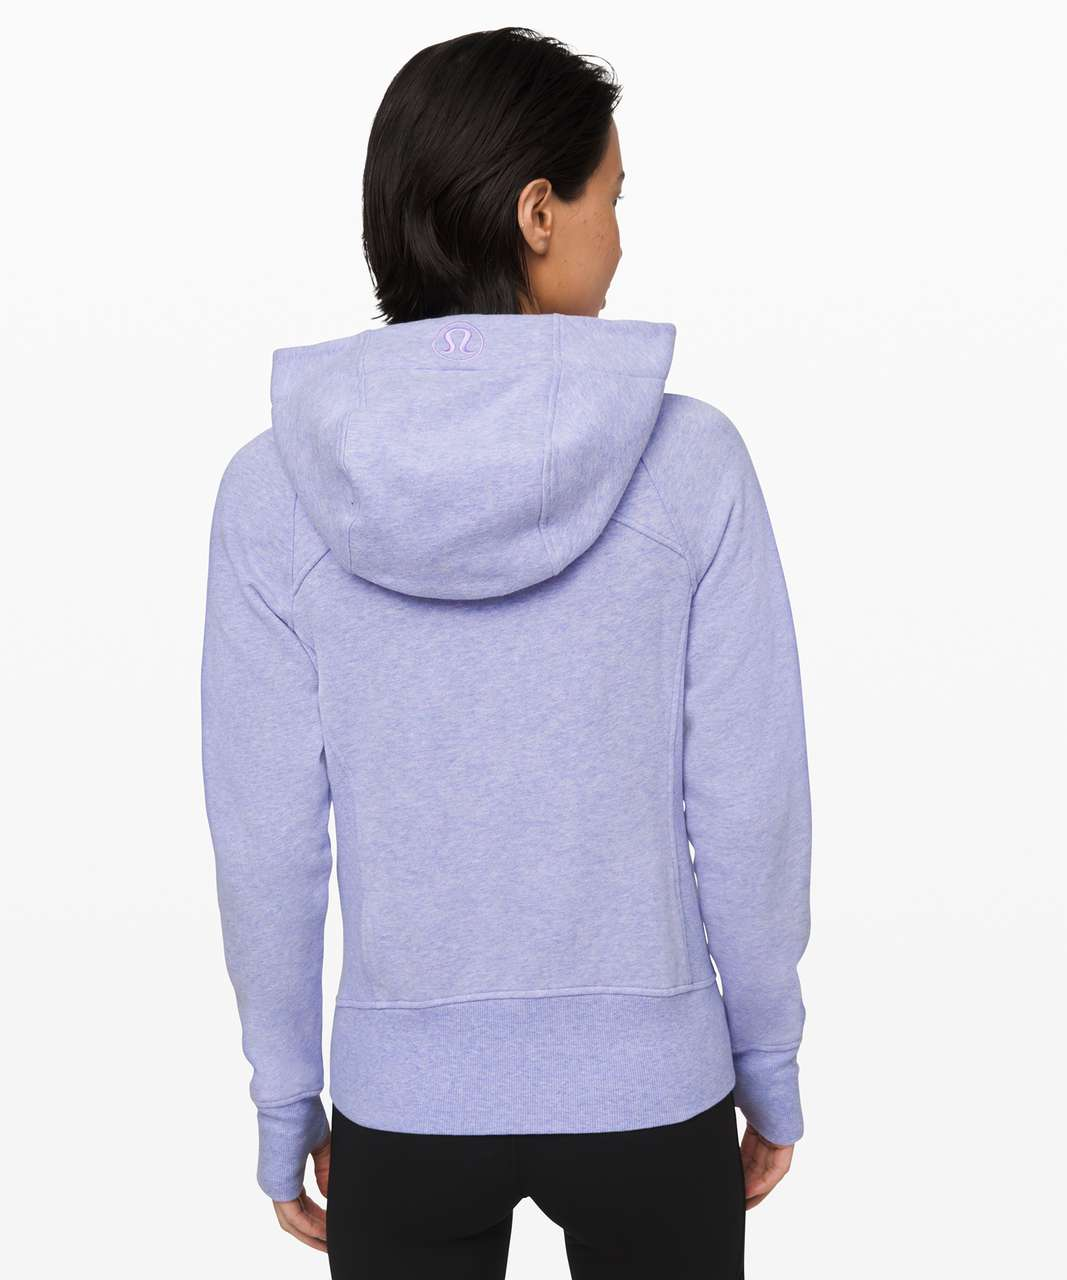 Lululemon Scuba Hoodie *Light Cotton Fleece - Heathered Lavender Dusk